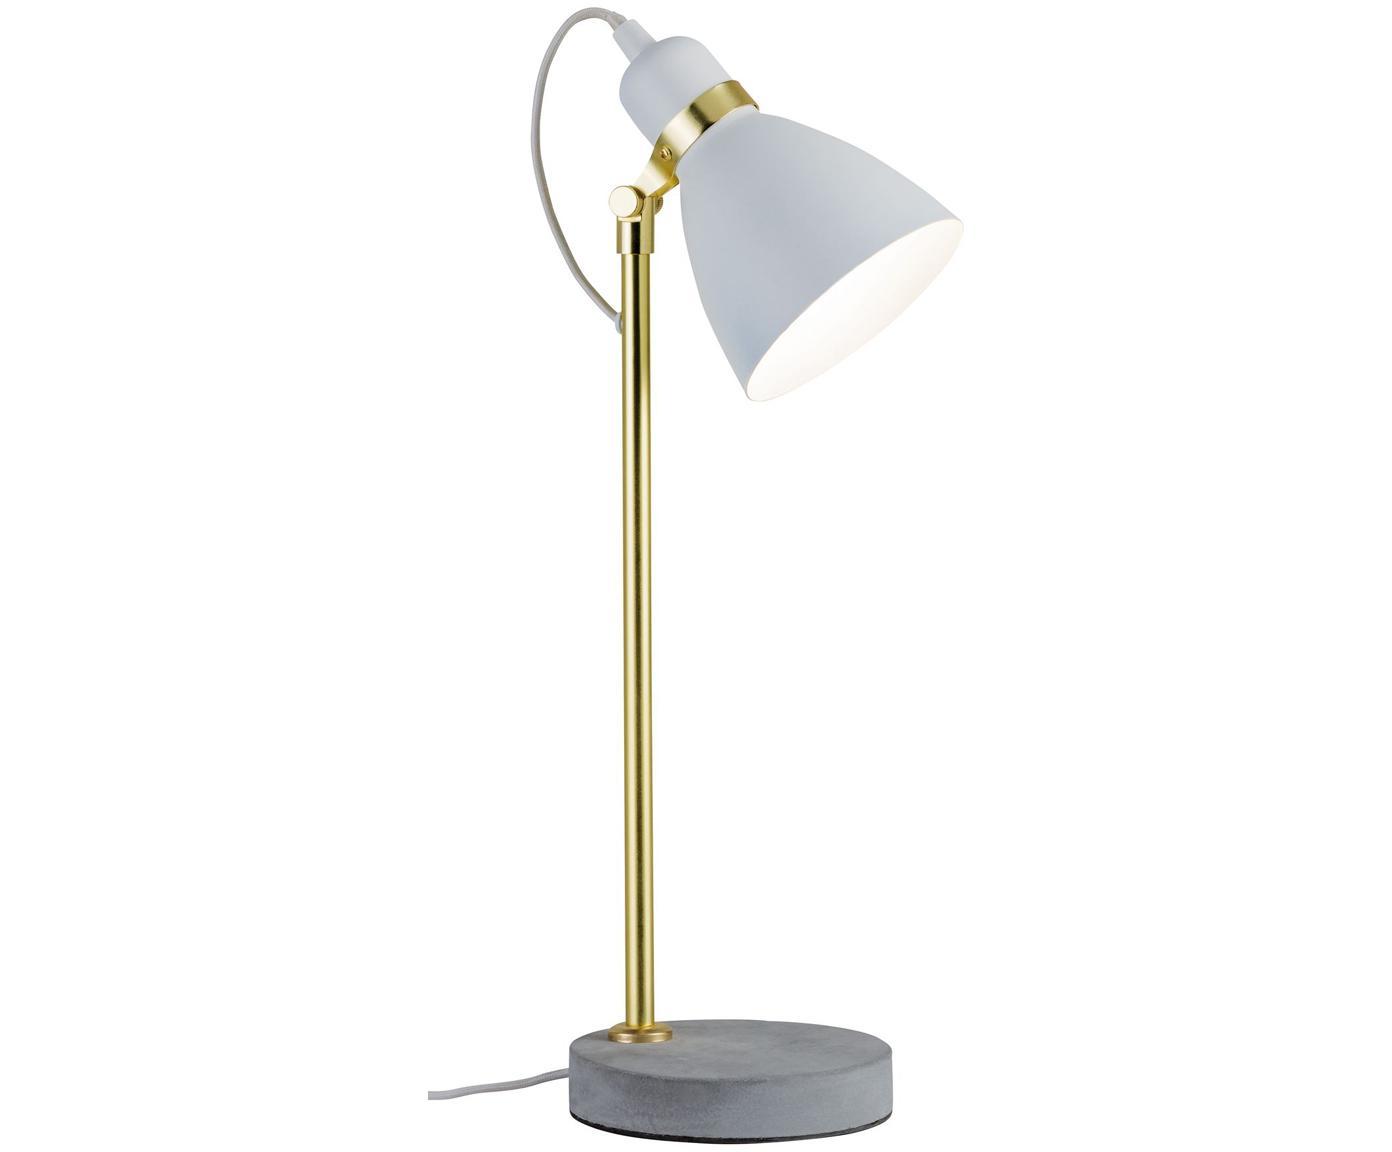 Retro tafellamp Orm, Lampvoet: beton, Wit, messingkleurig, grijs, Ø 15 x H 50 cm